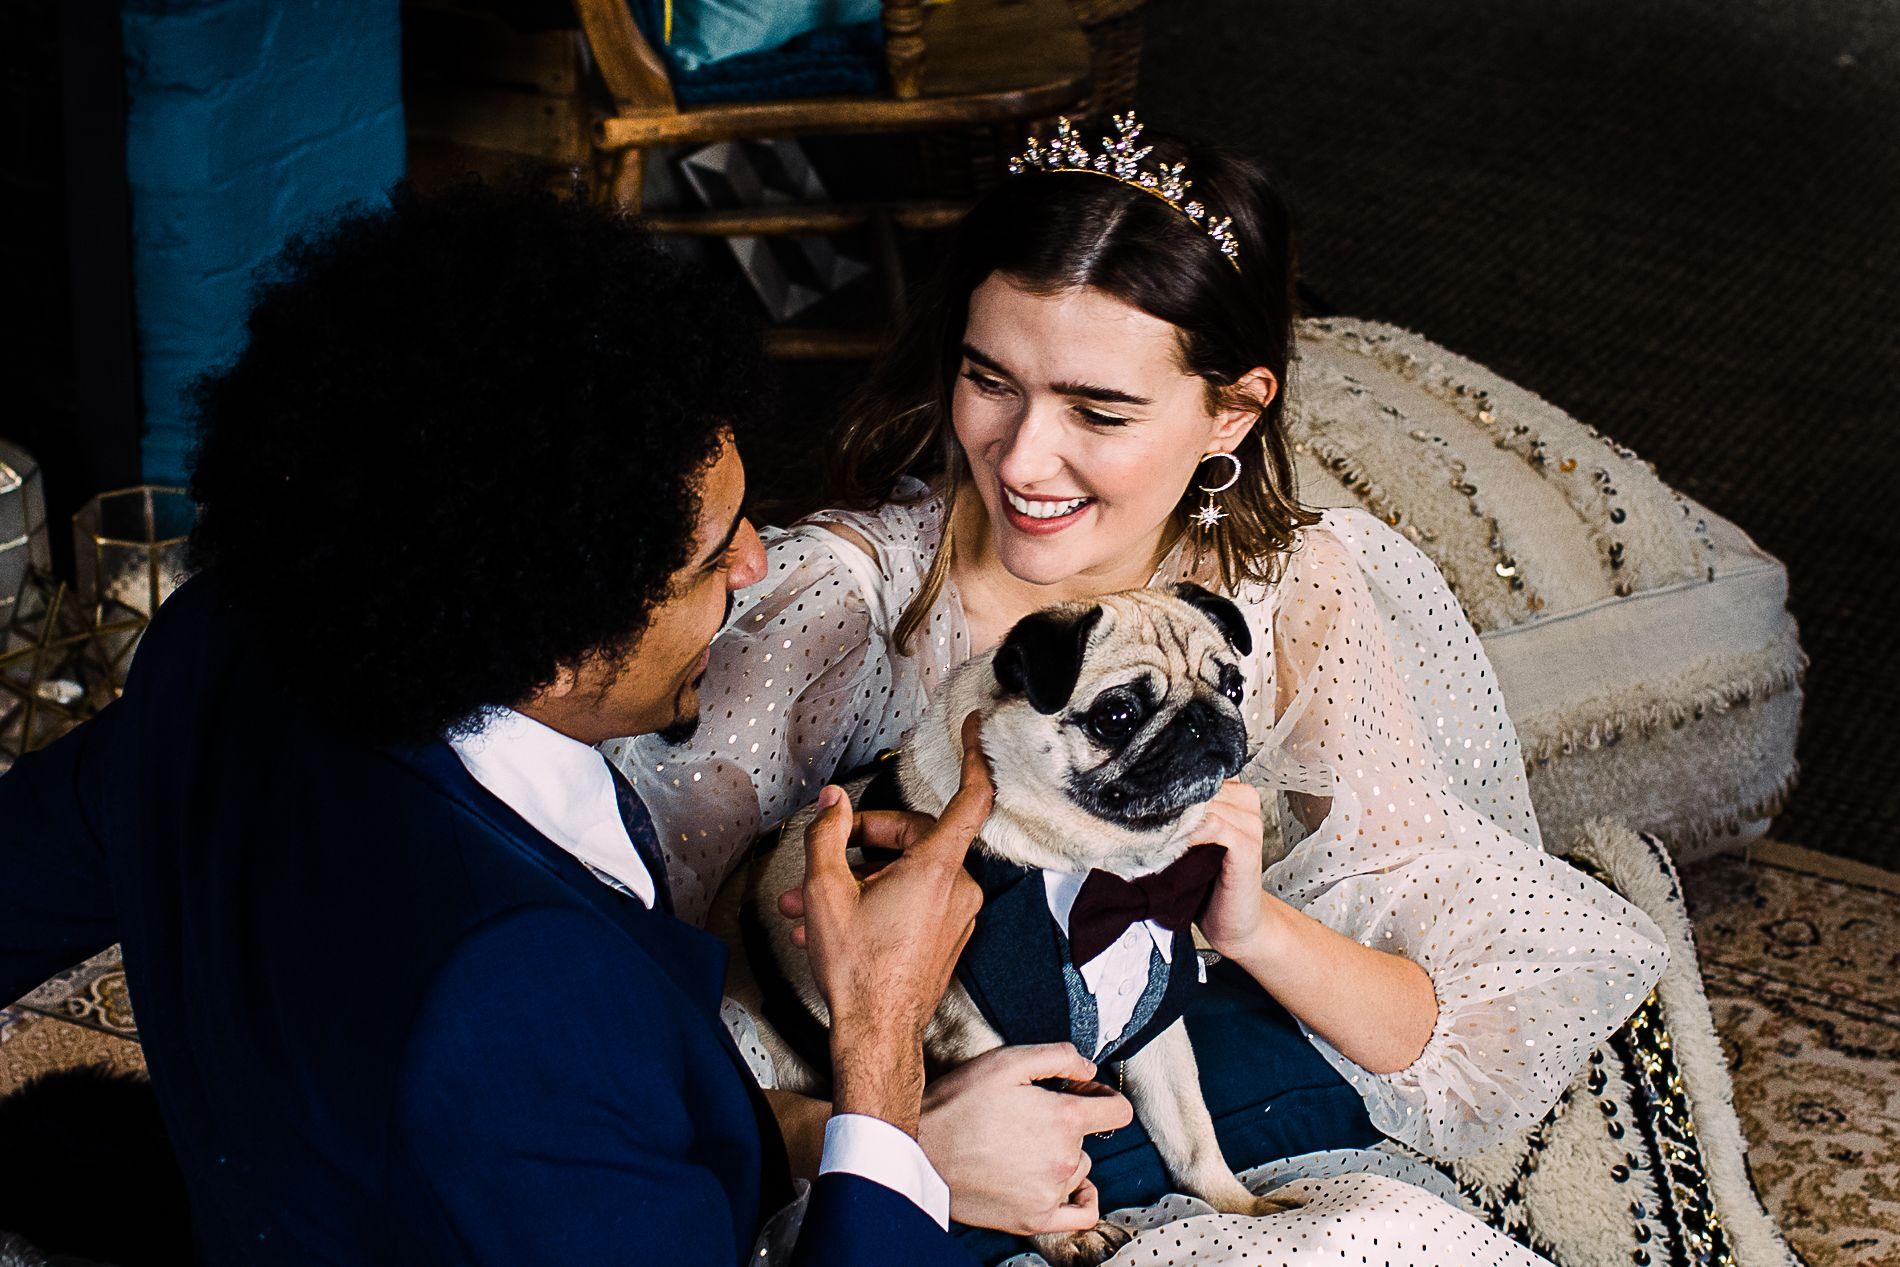 Wedding_Photography_Becky_Tranter-58.jpg